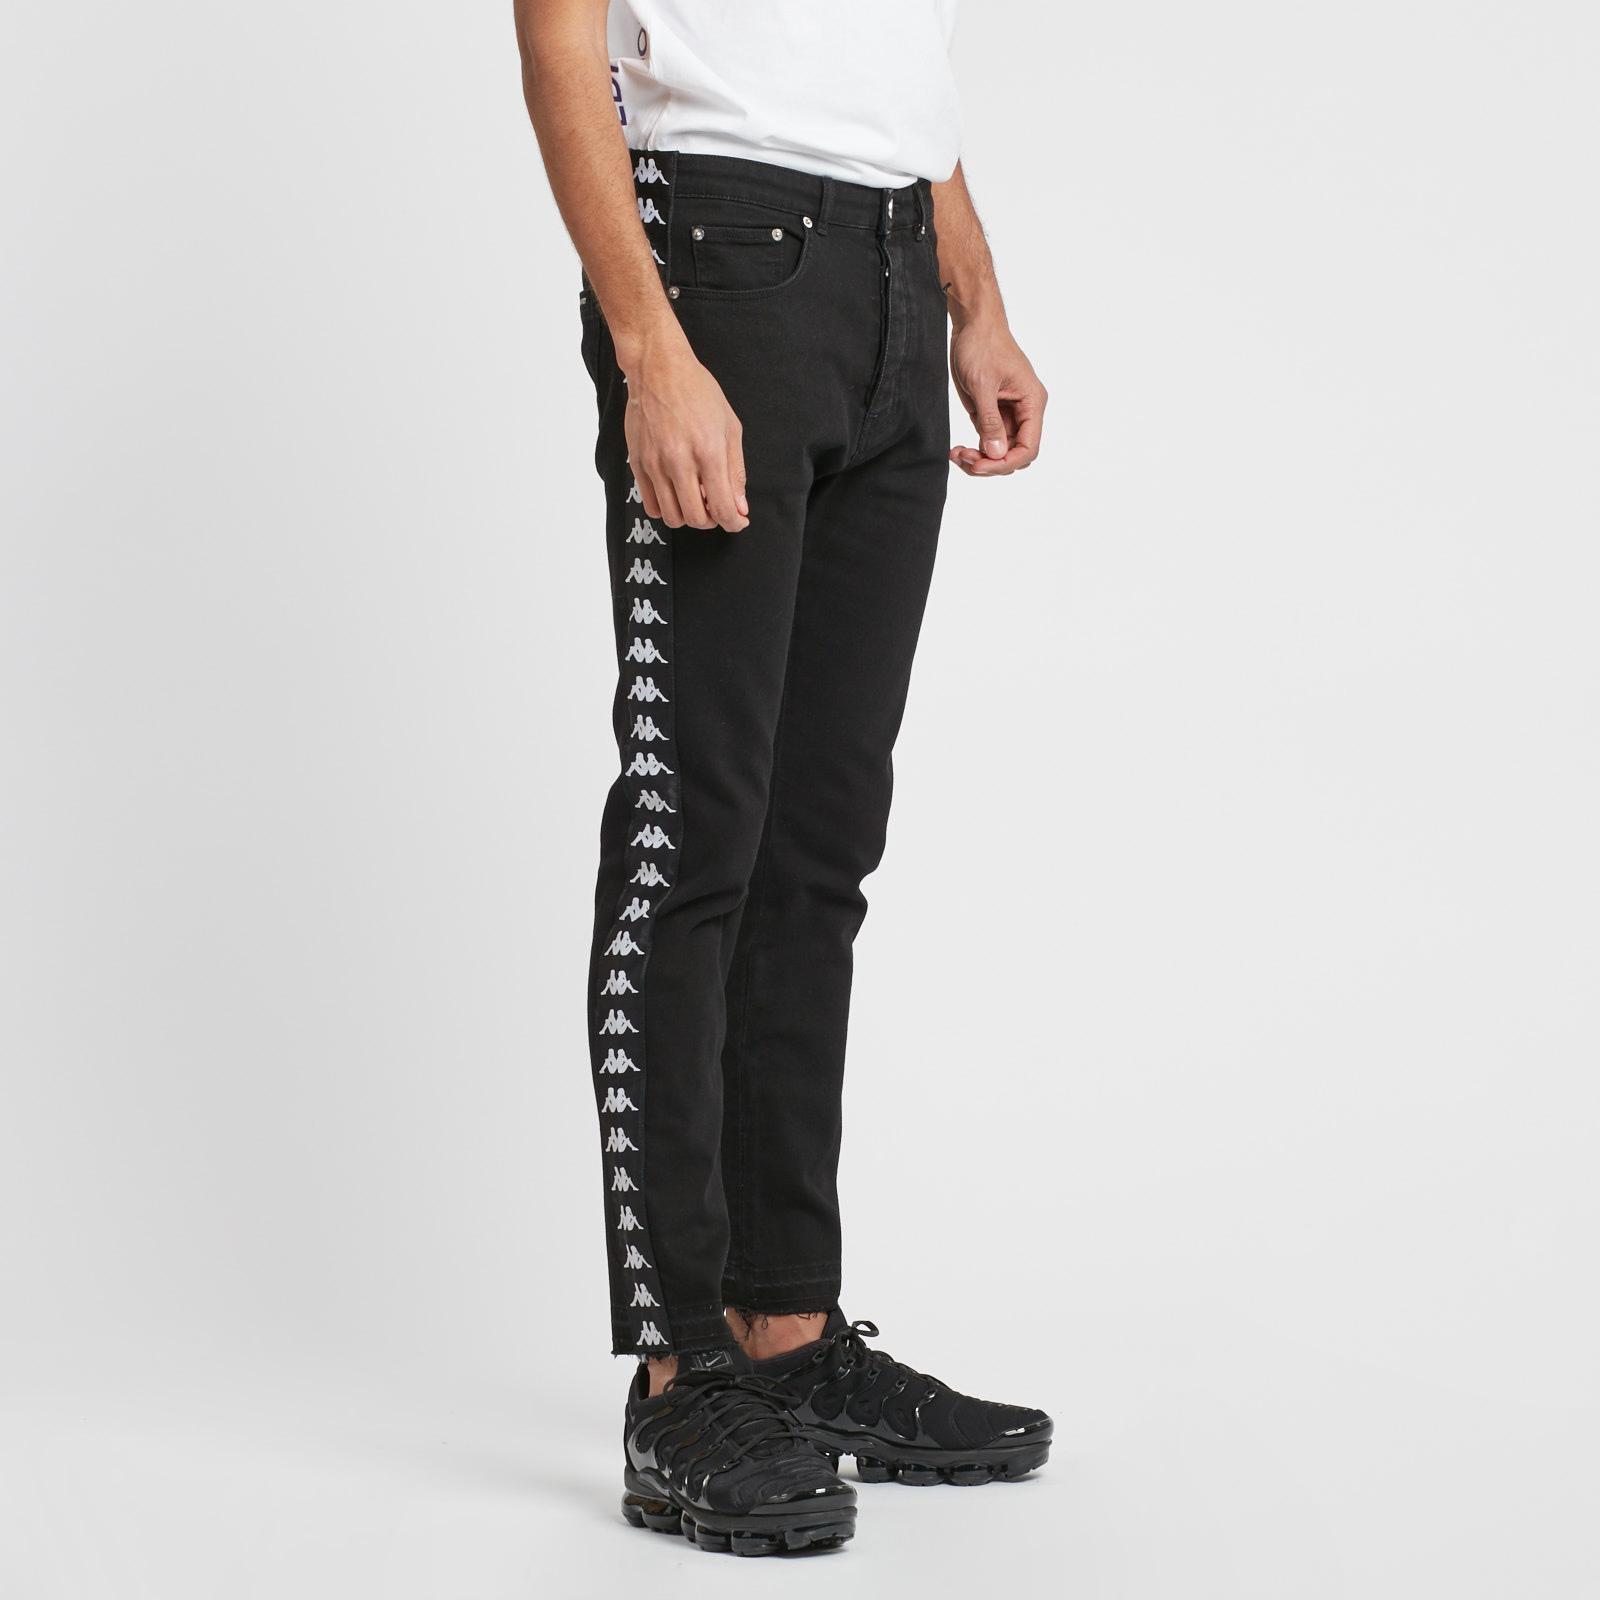 af2369a3 Kappa Kontroll Denim Pants - 303z0f0 - Sneakersnstuff | sneakers ...